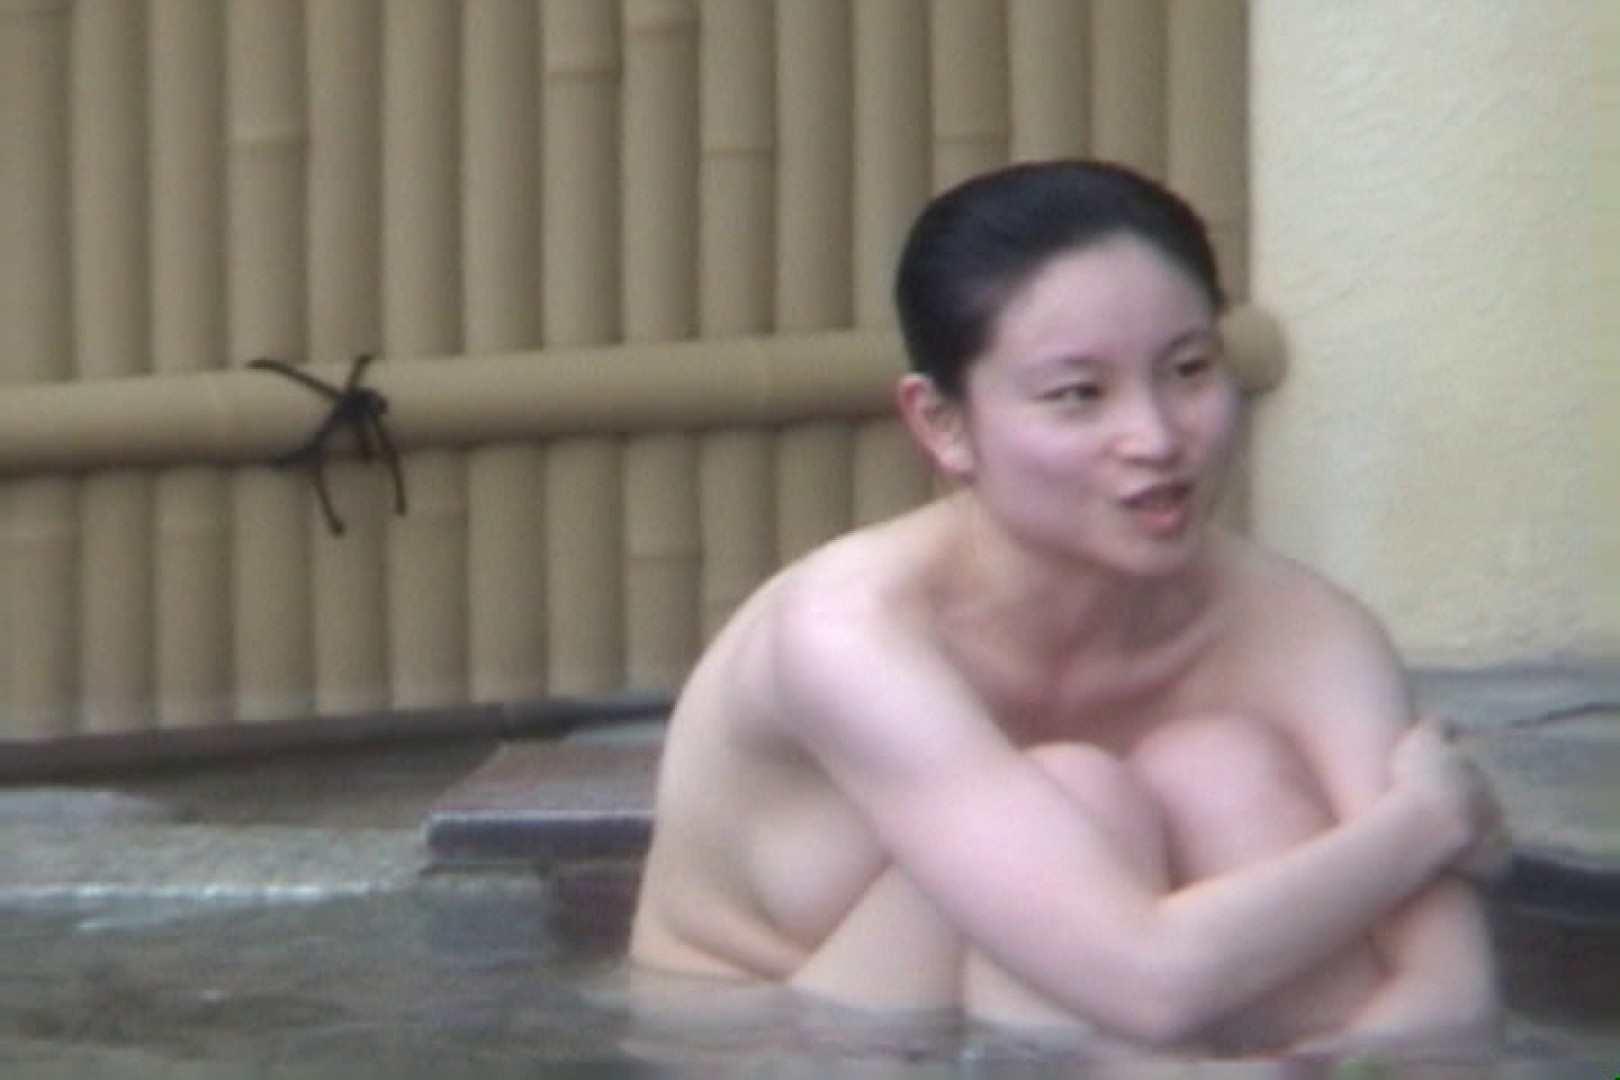 Aquaな露天風呂Vol.45【VIP限定】 HなOL   盗撮  100pic 44